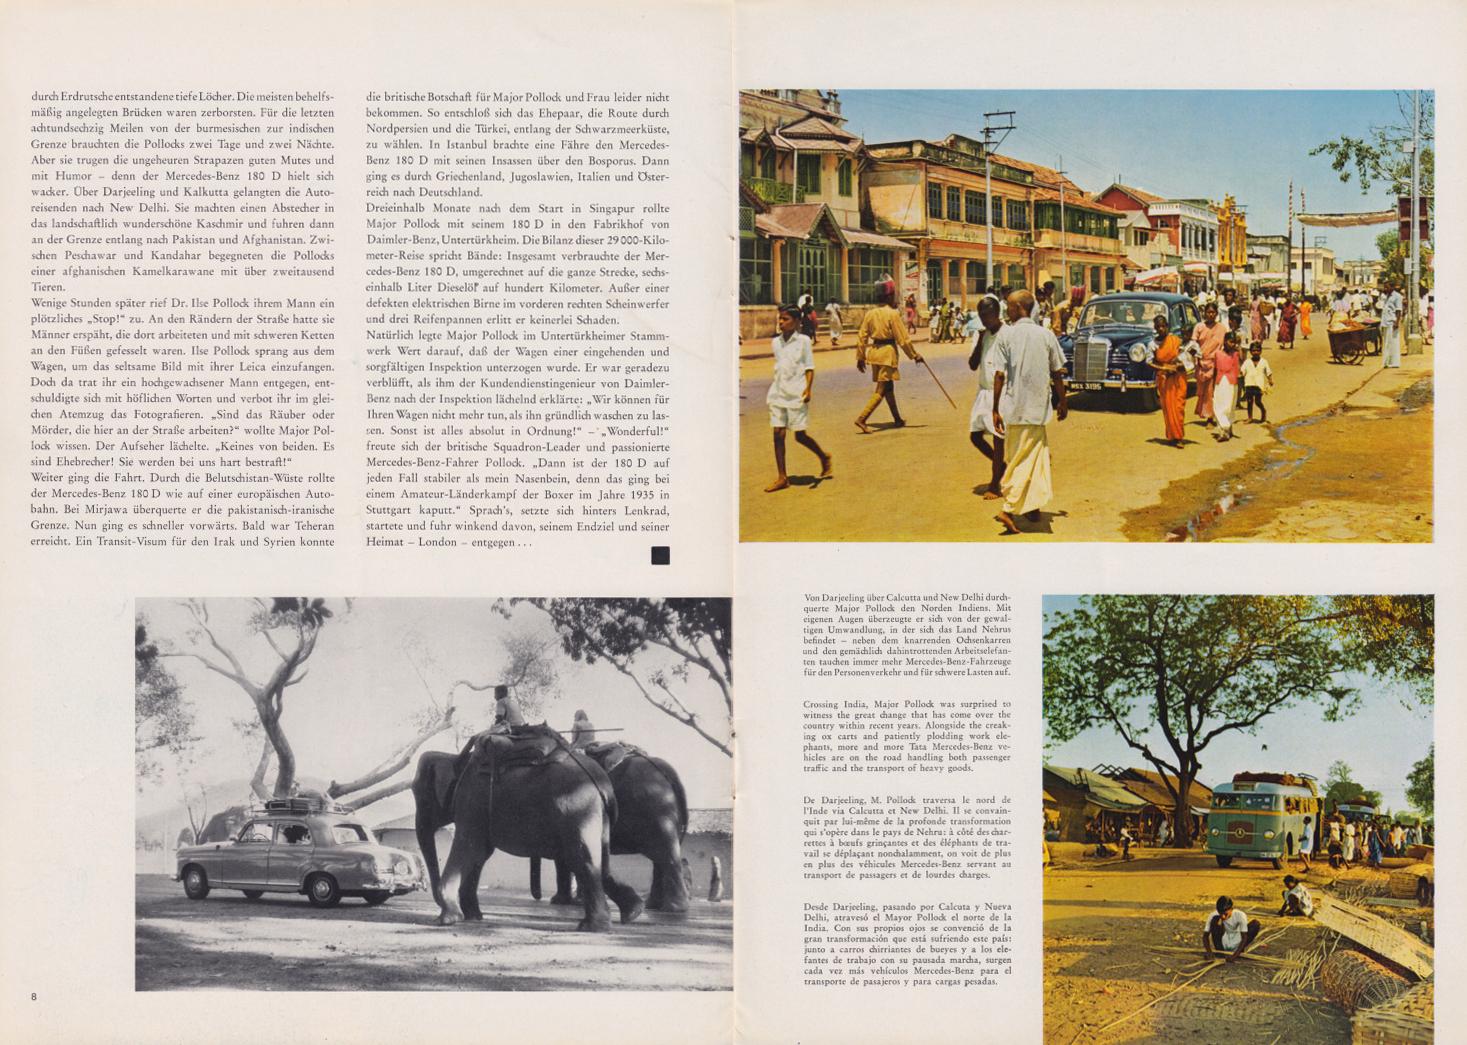 (REVISTA): Periódico In aller welt n.º 32 - Mercedes-Benz no mundo - 1959 - multilingue 005